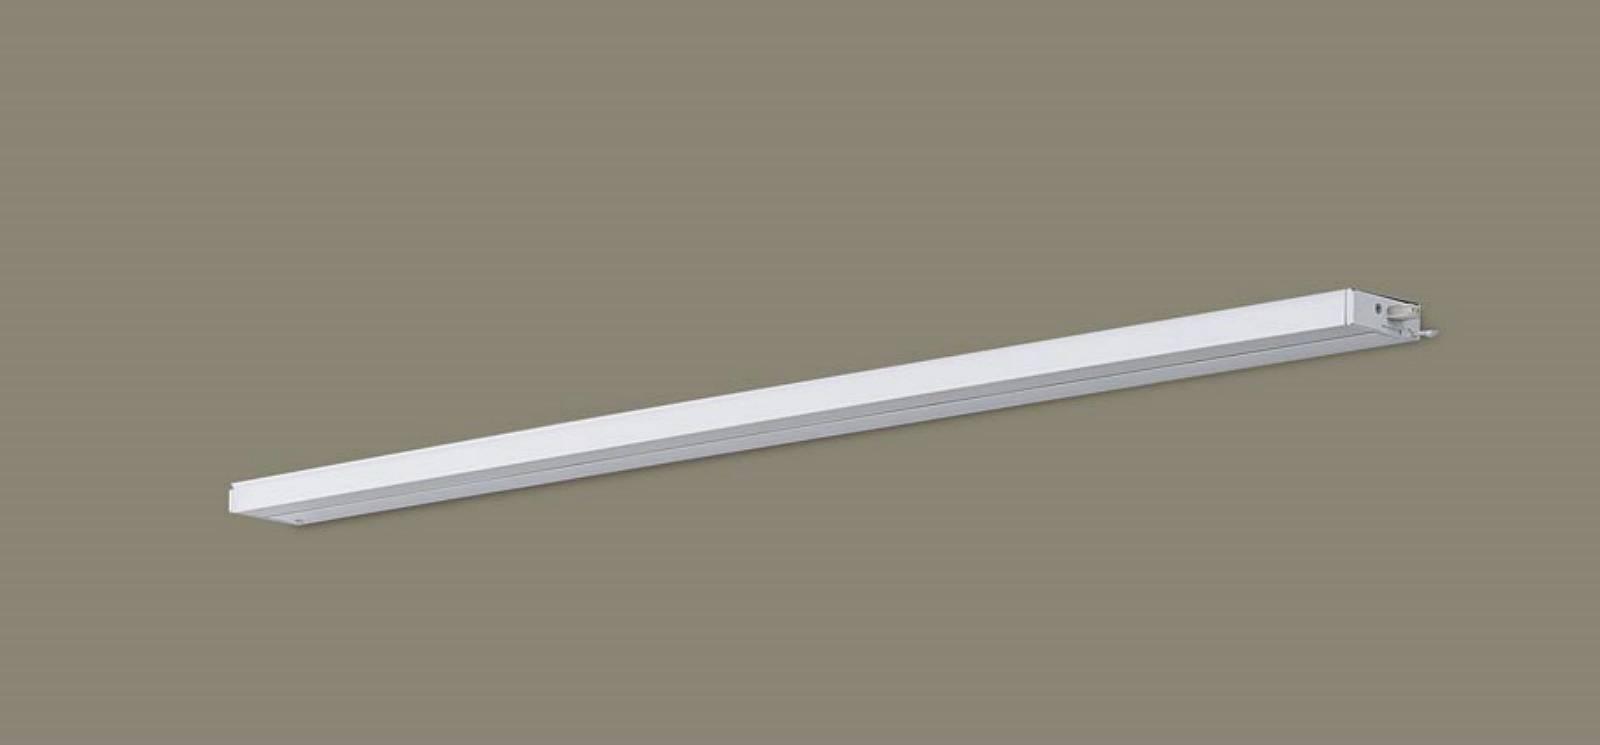 T区分 パナソニック LGB51356XG1 ベースライト 建築化照明器具 単独使用不可 畳数設定無し LED【setsuden_led】